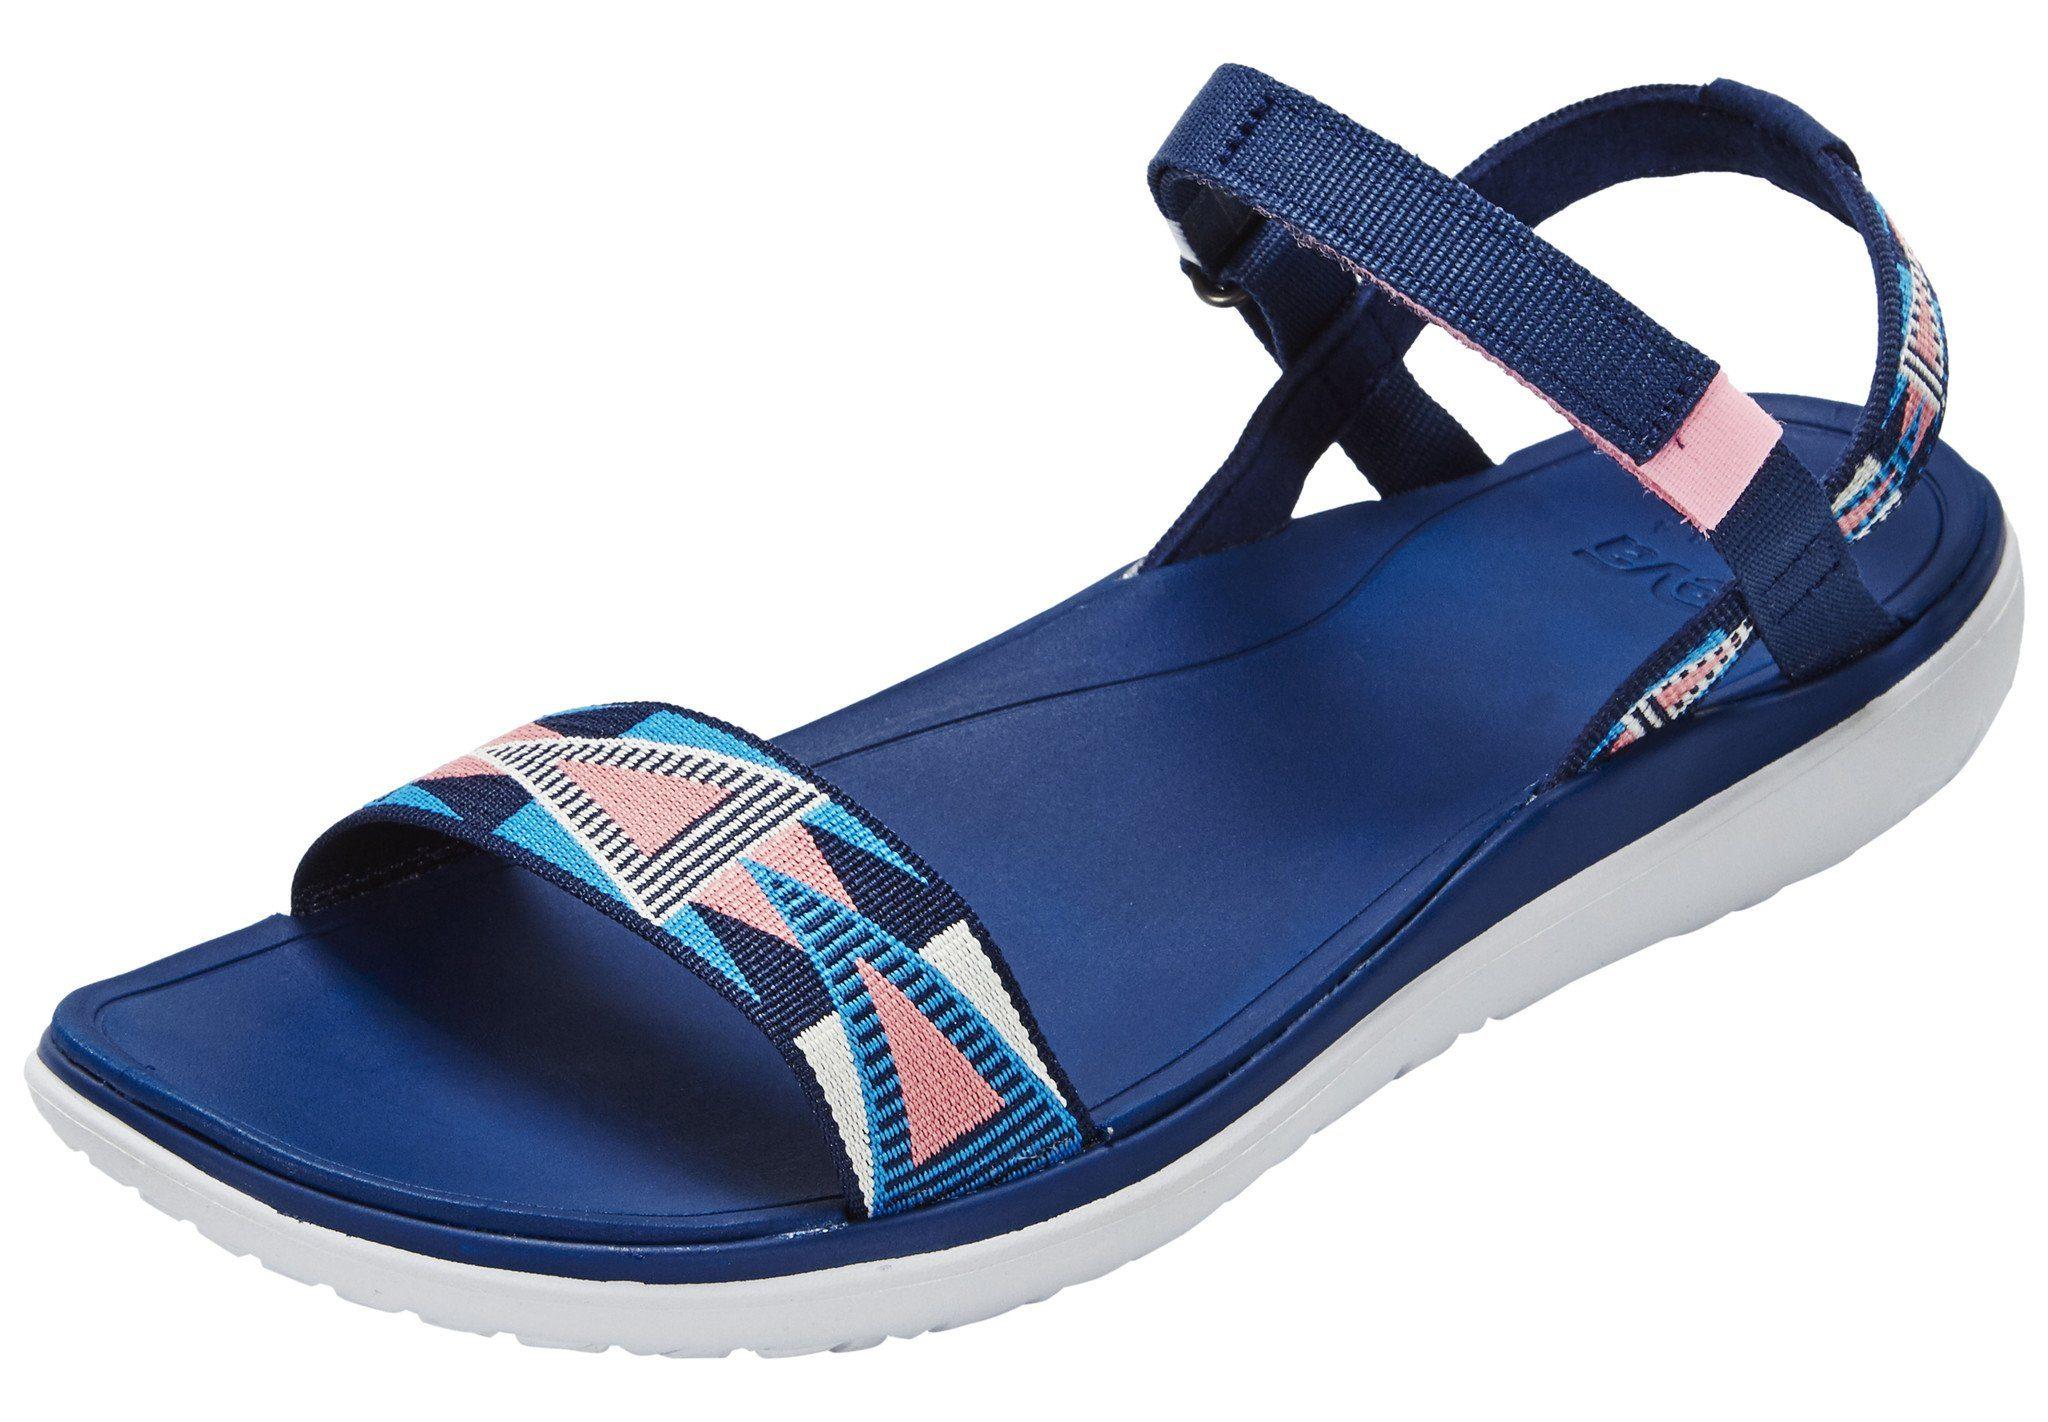 Teva Terra Fi 5 Universal Damenschuhe Sandalen Multicolor